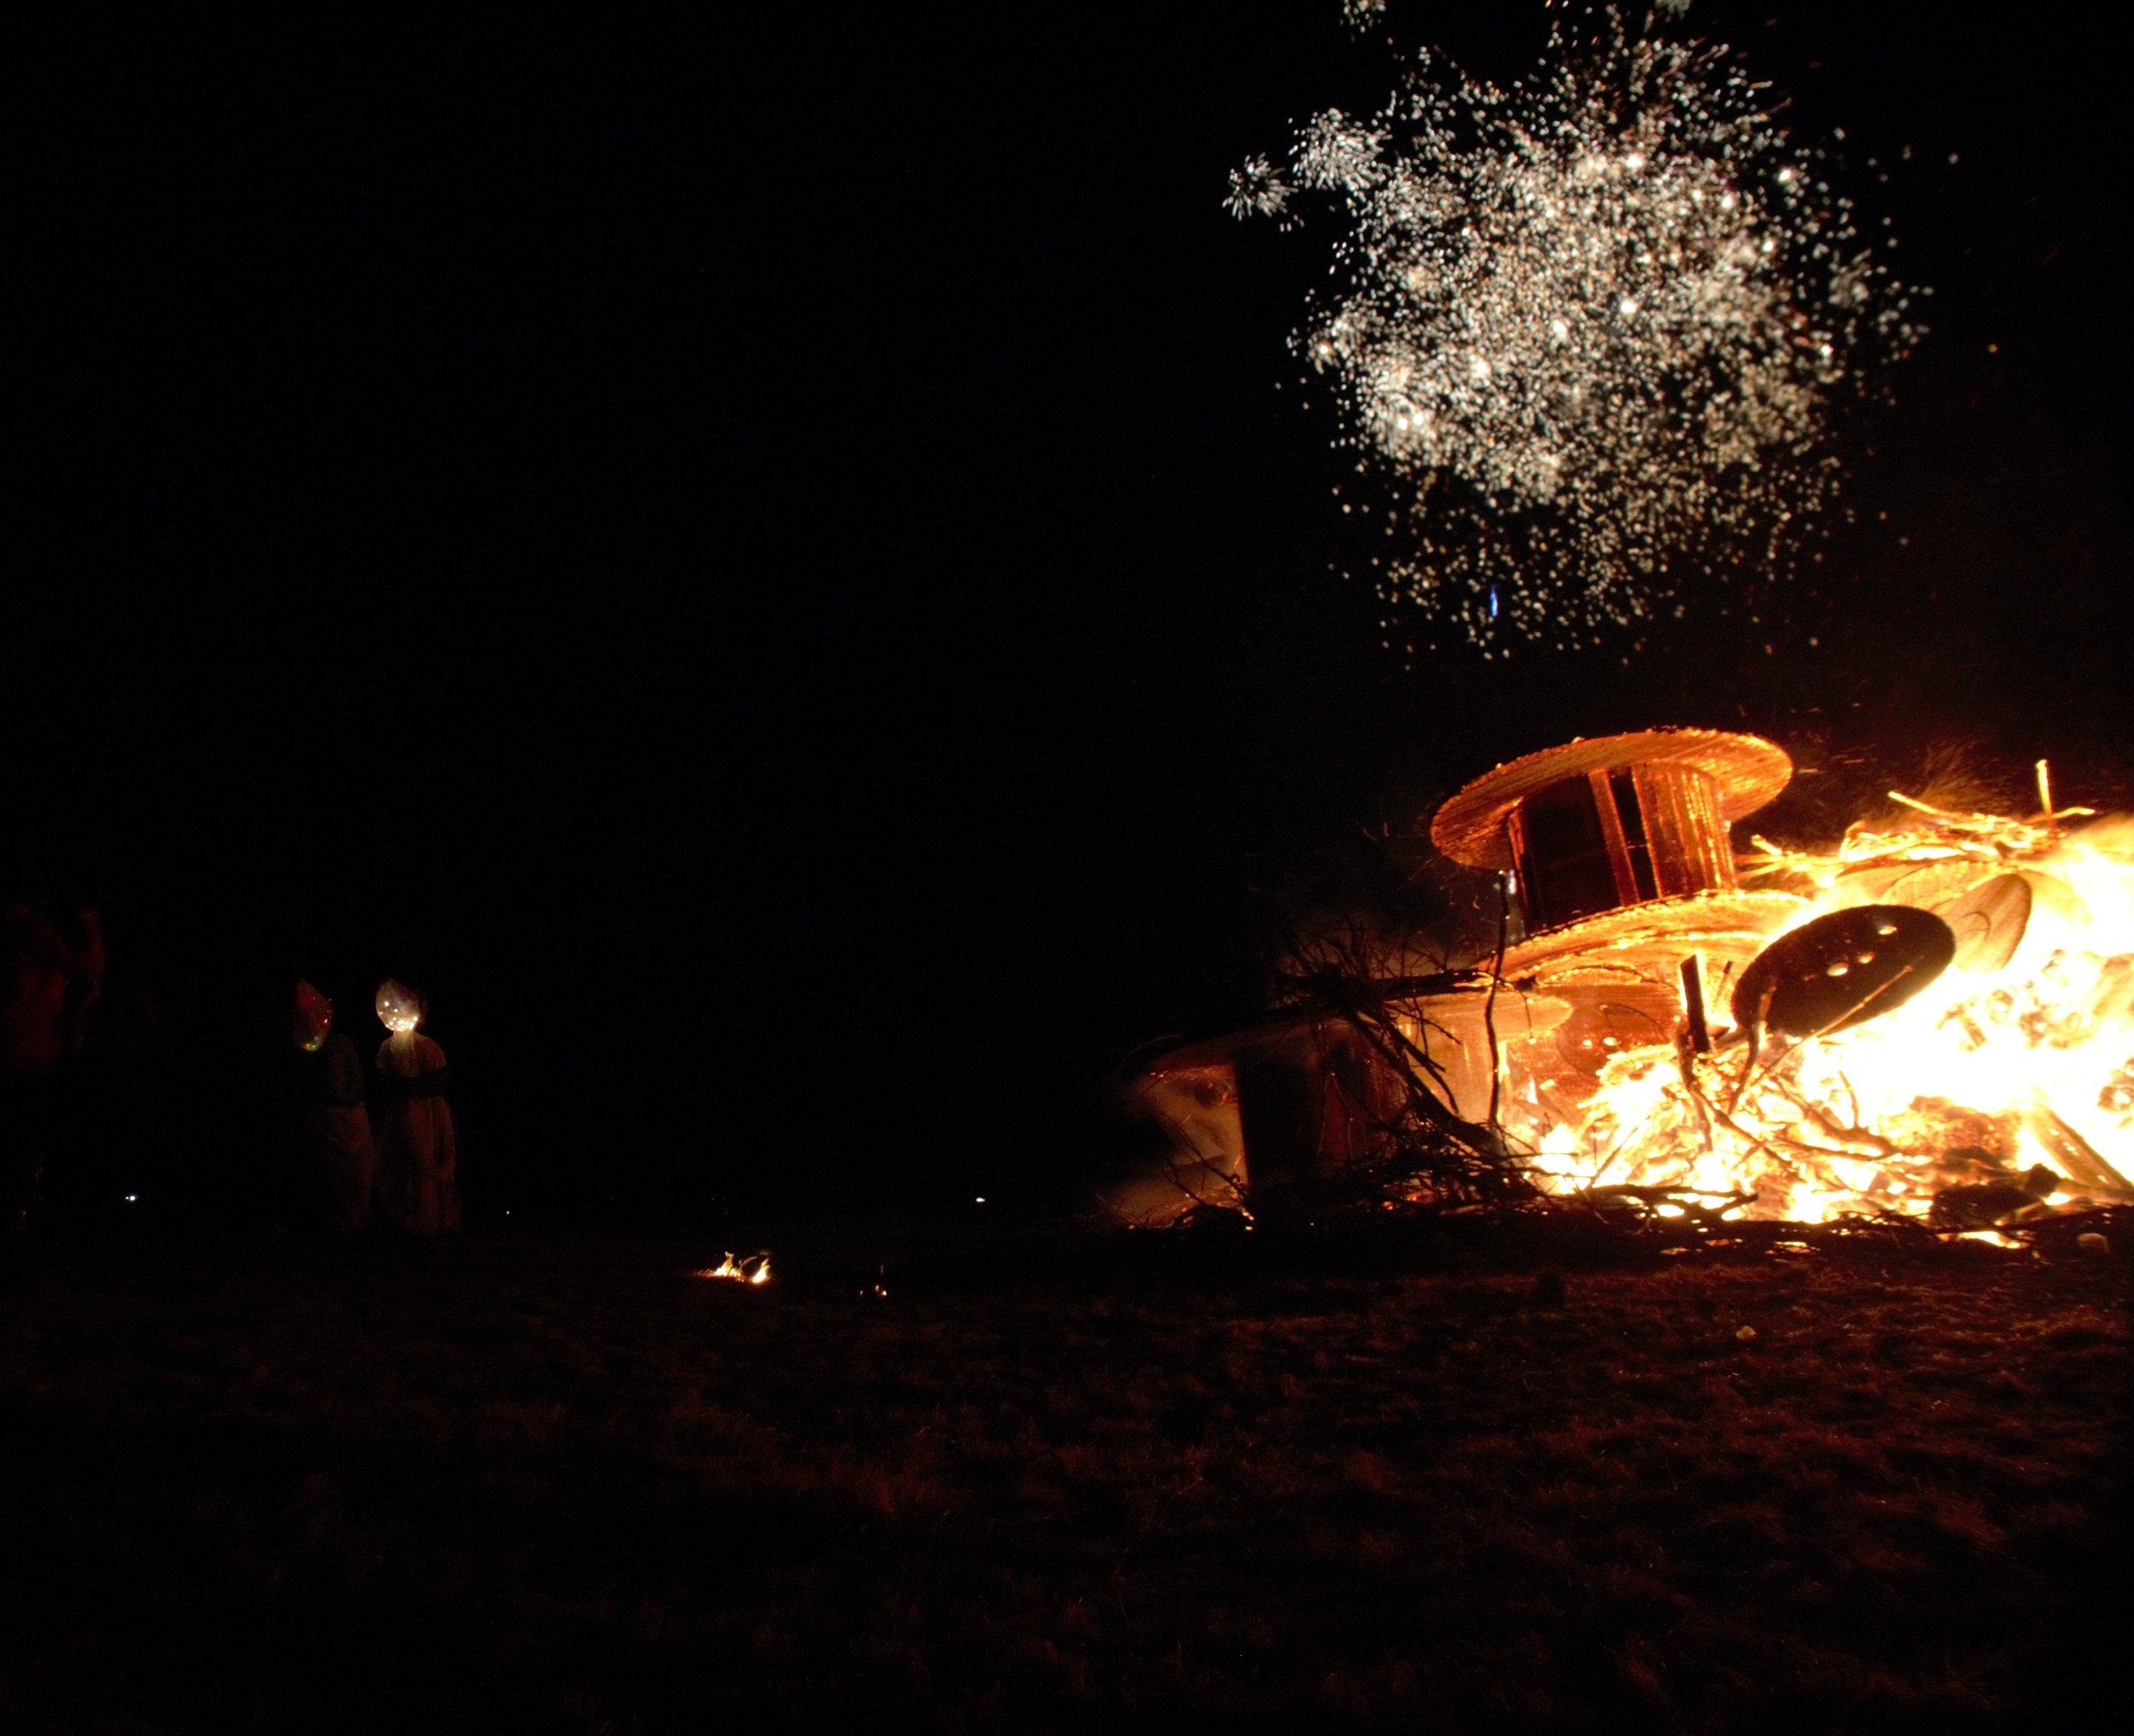 Bonfireworks - Lucas Fried